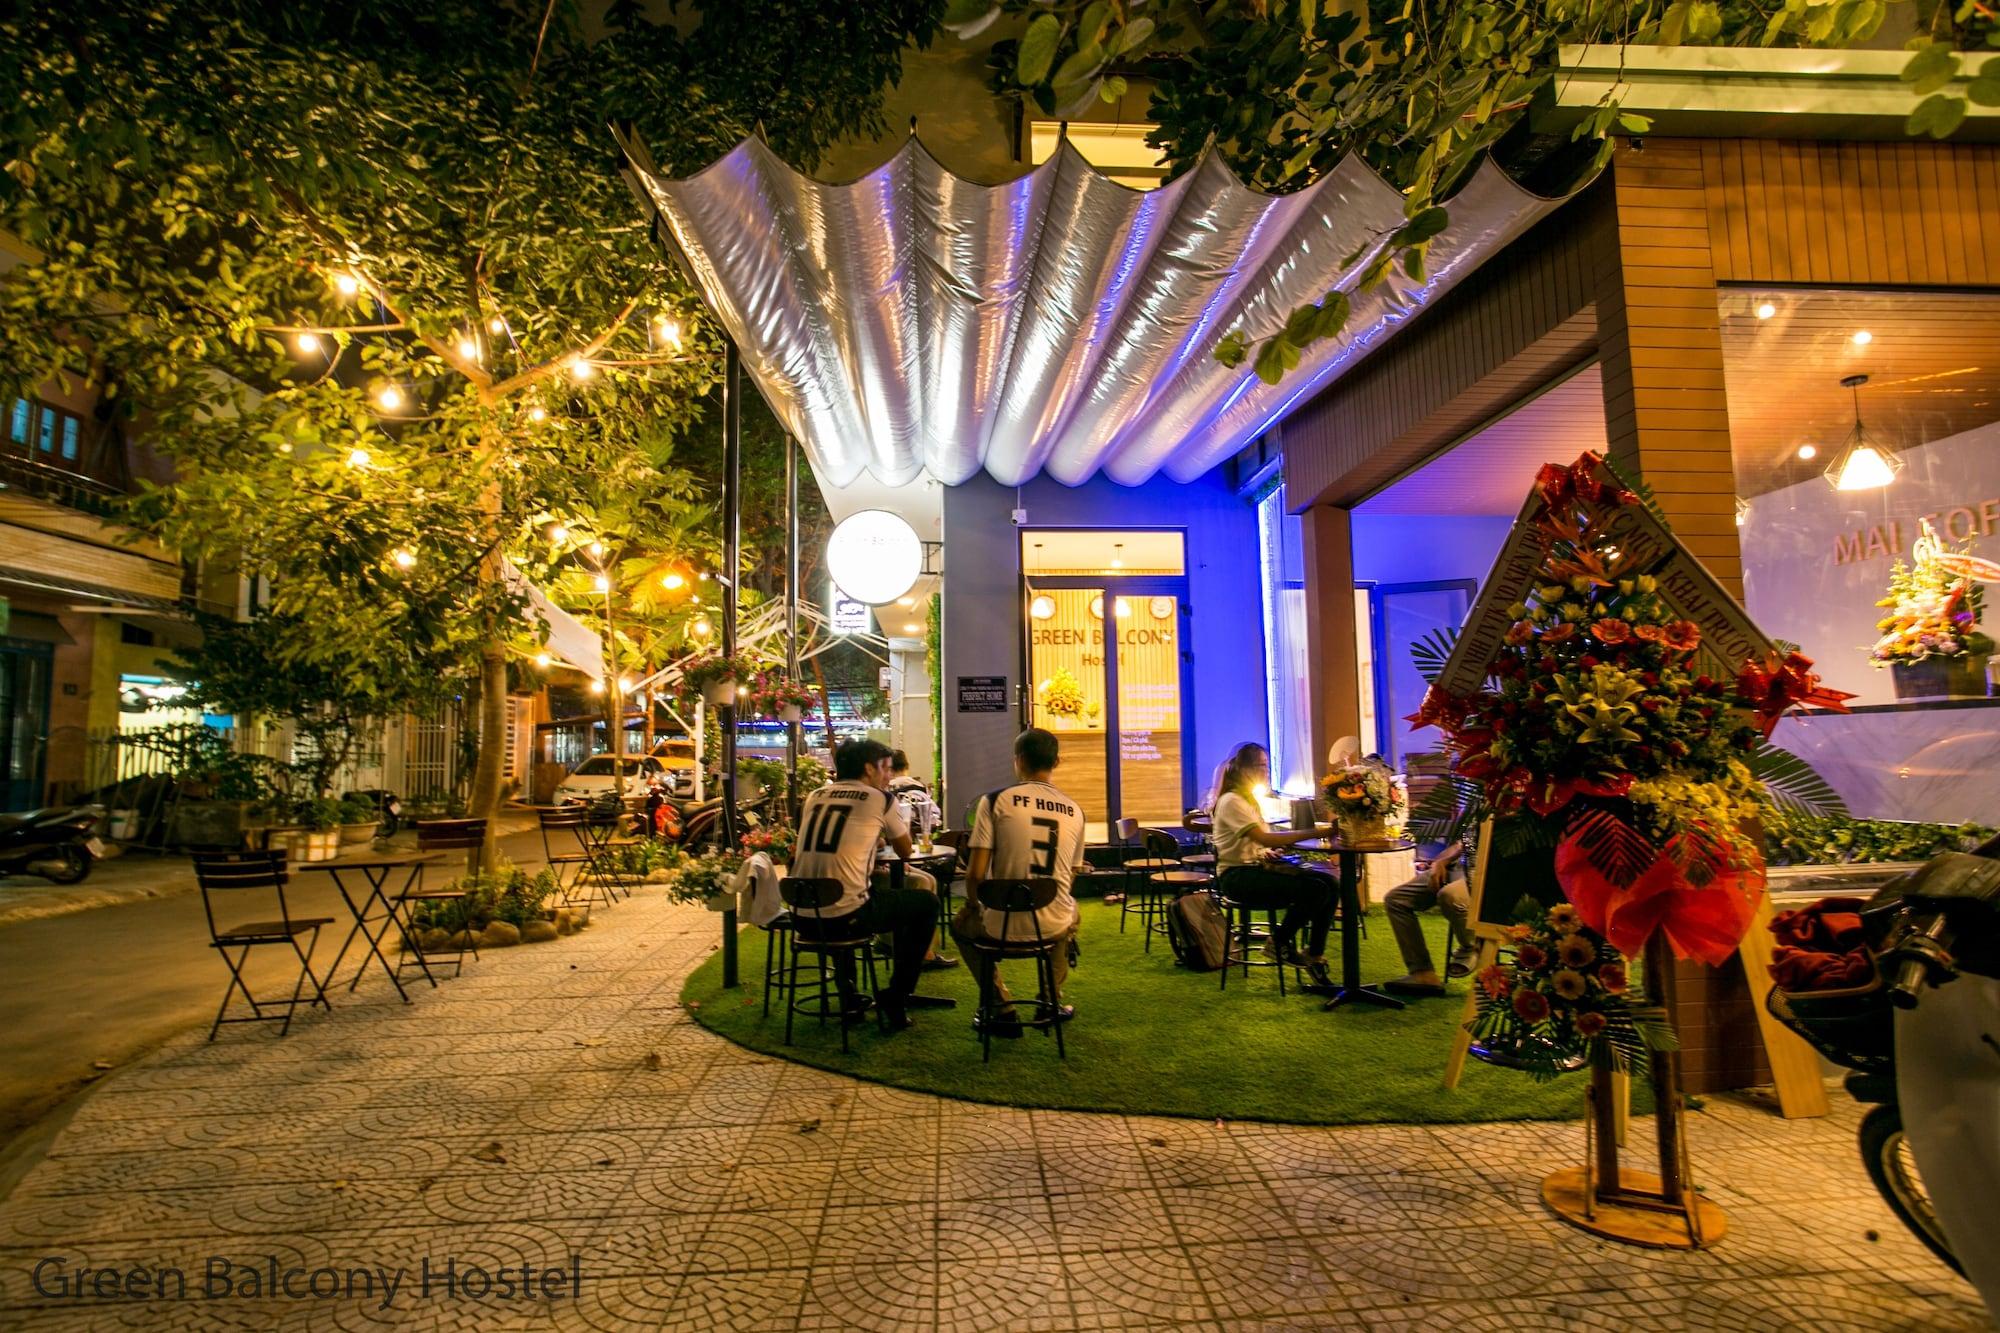 Green Balcony Hostel & Coffee, Sơn Trà